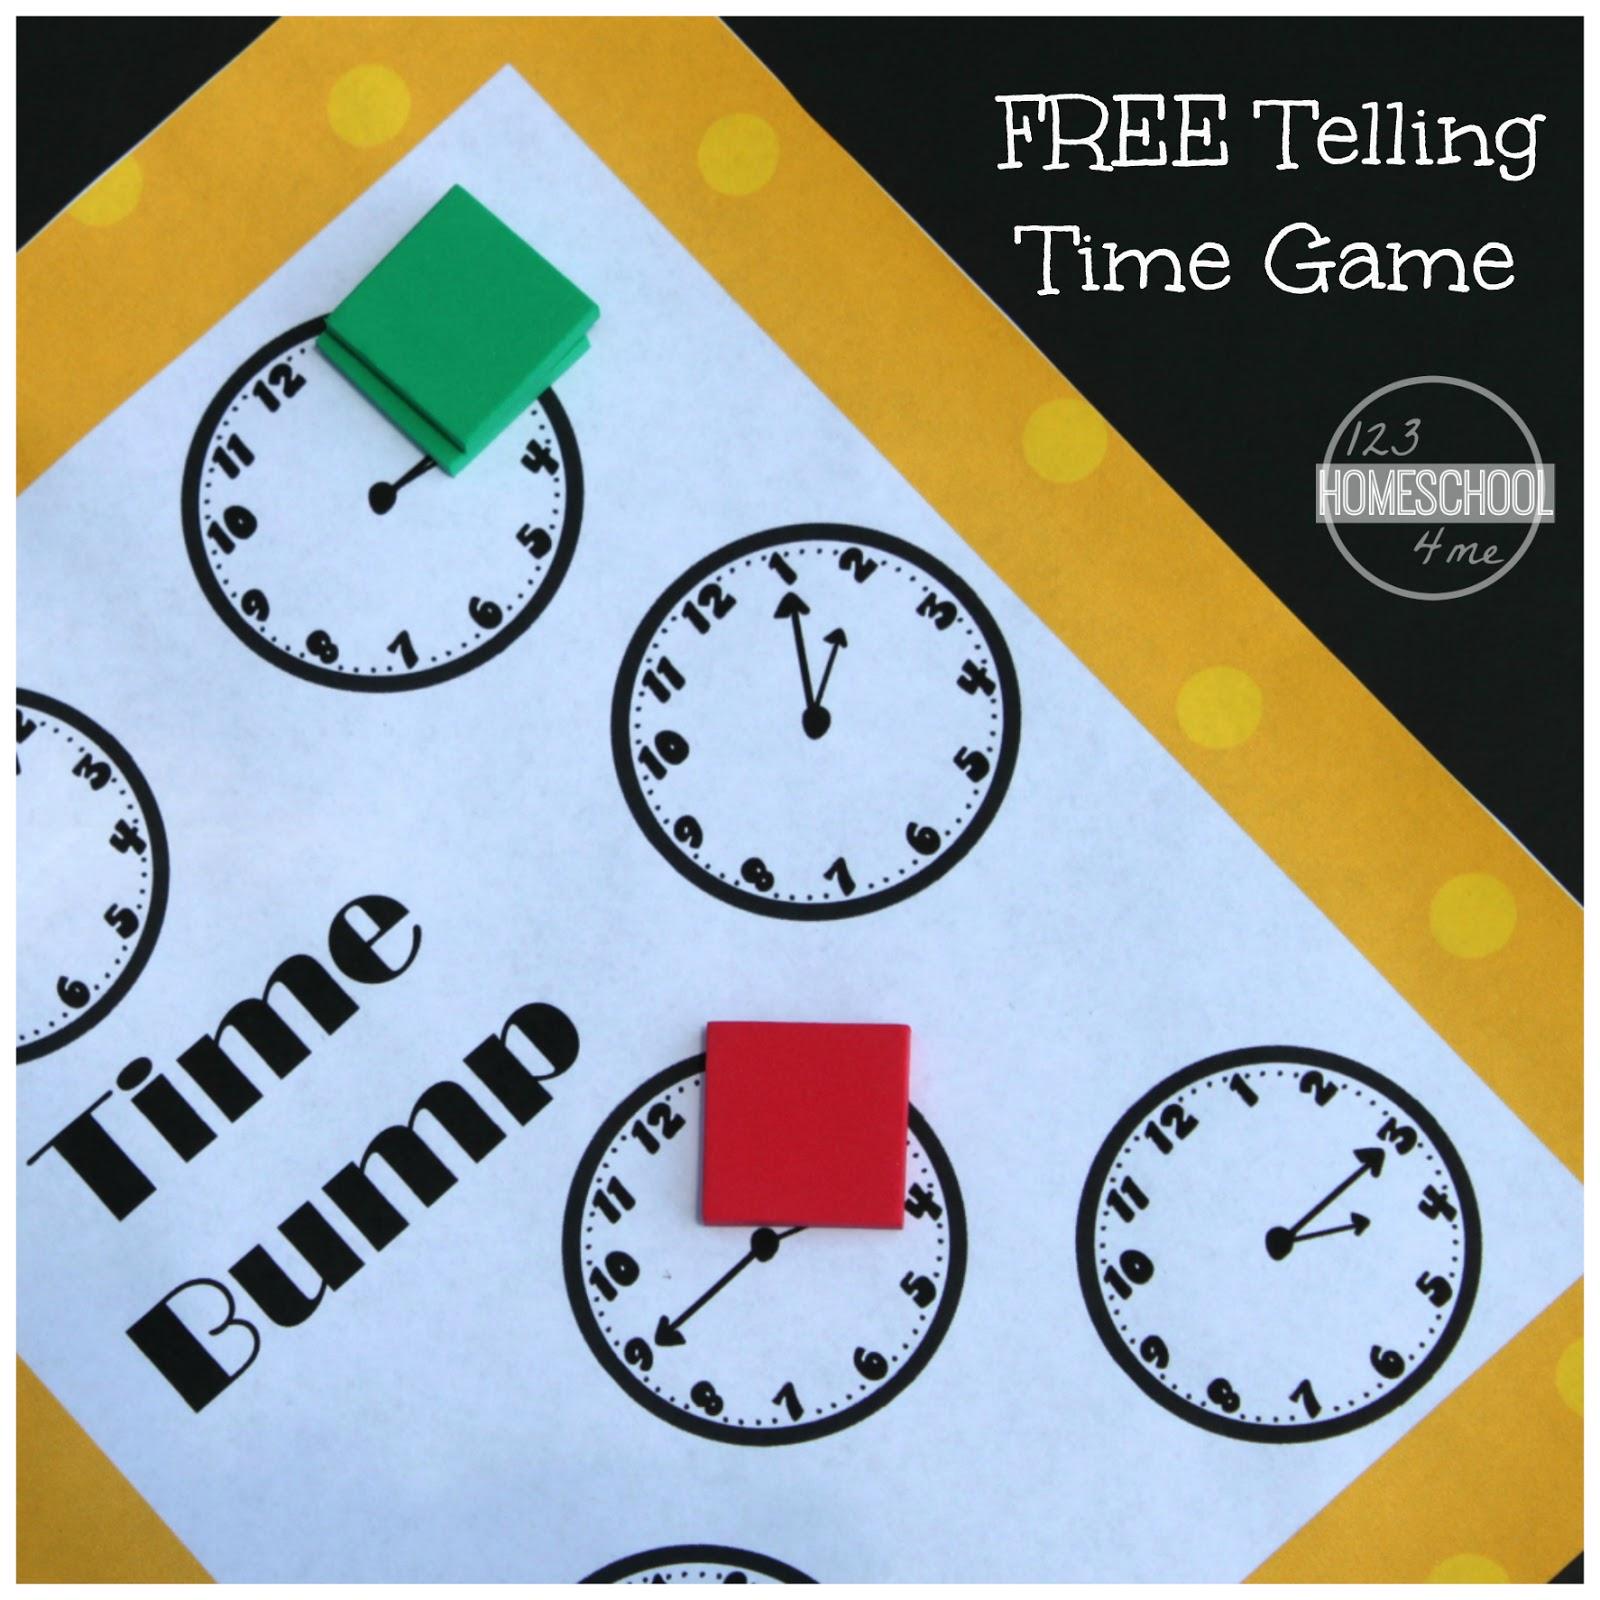 Time Bump Clock Game